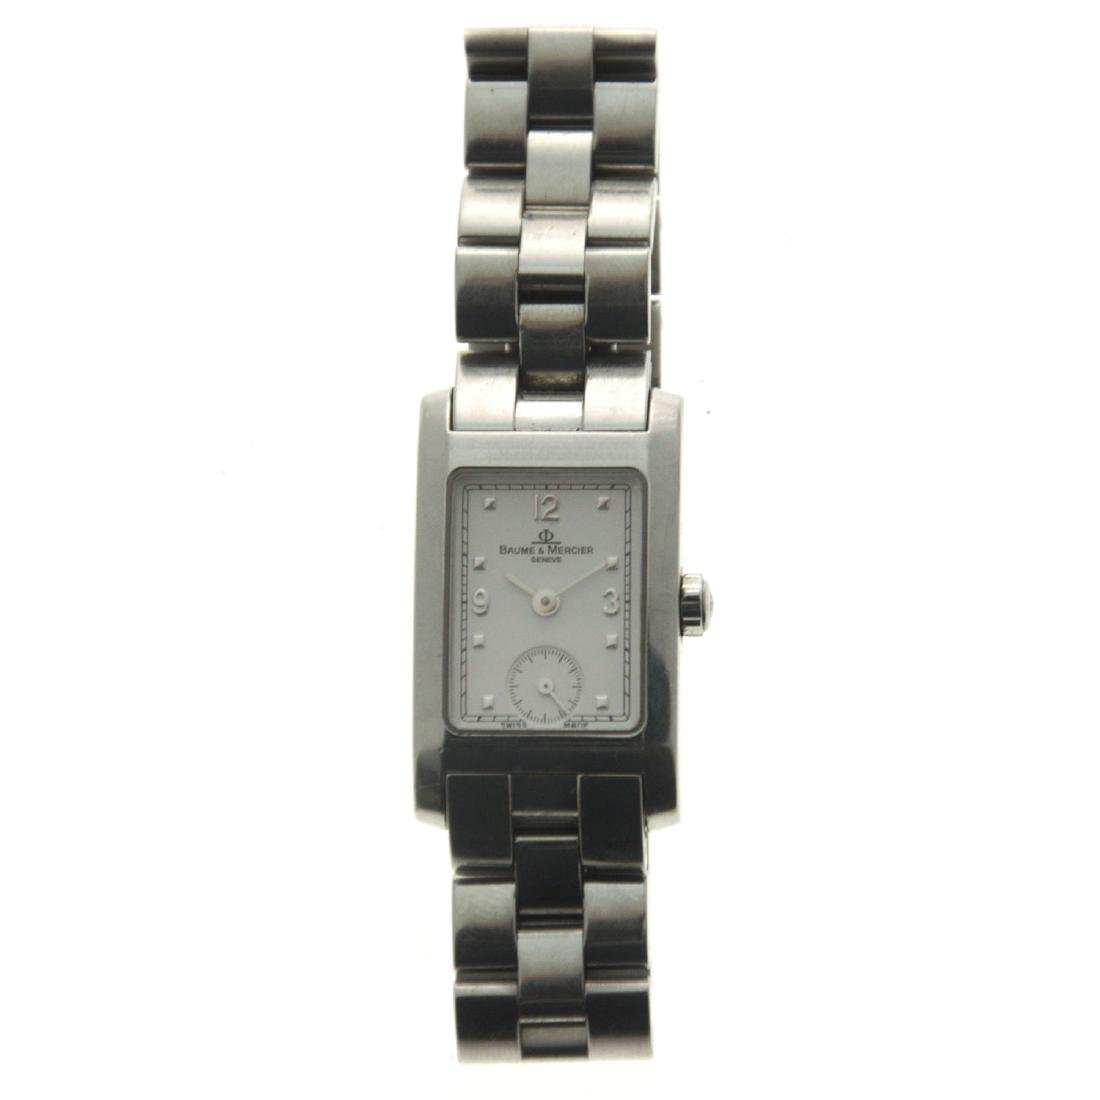 Baume & Mercier Lady's Wrist Watch. - 2